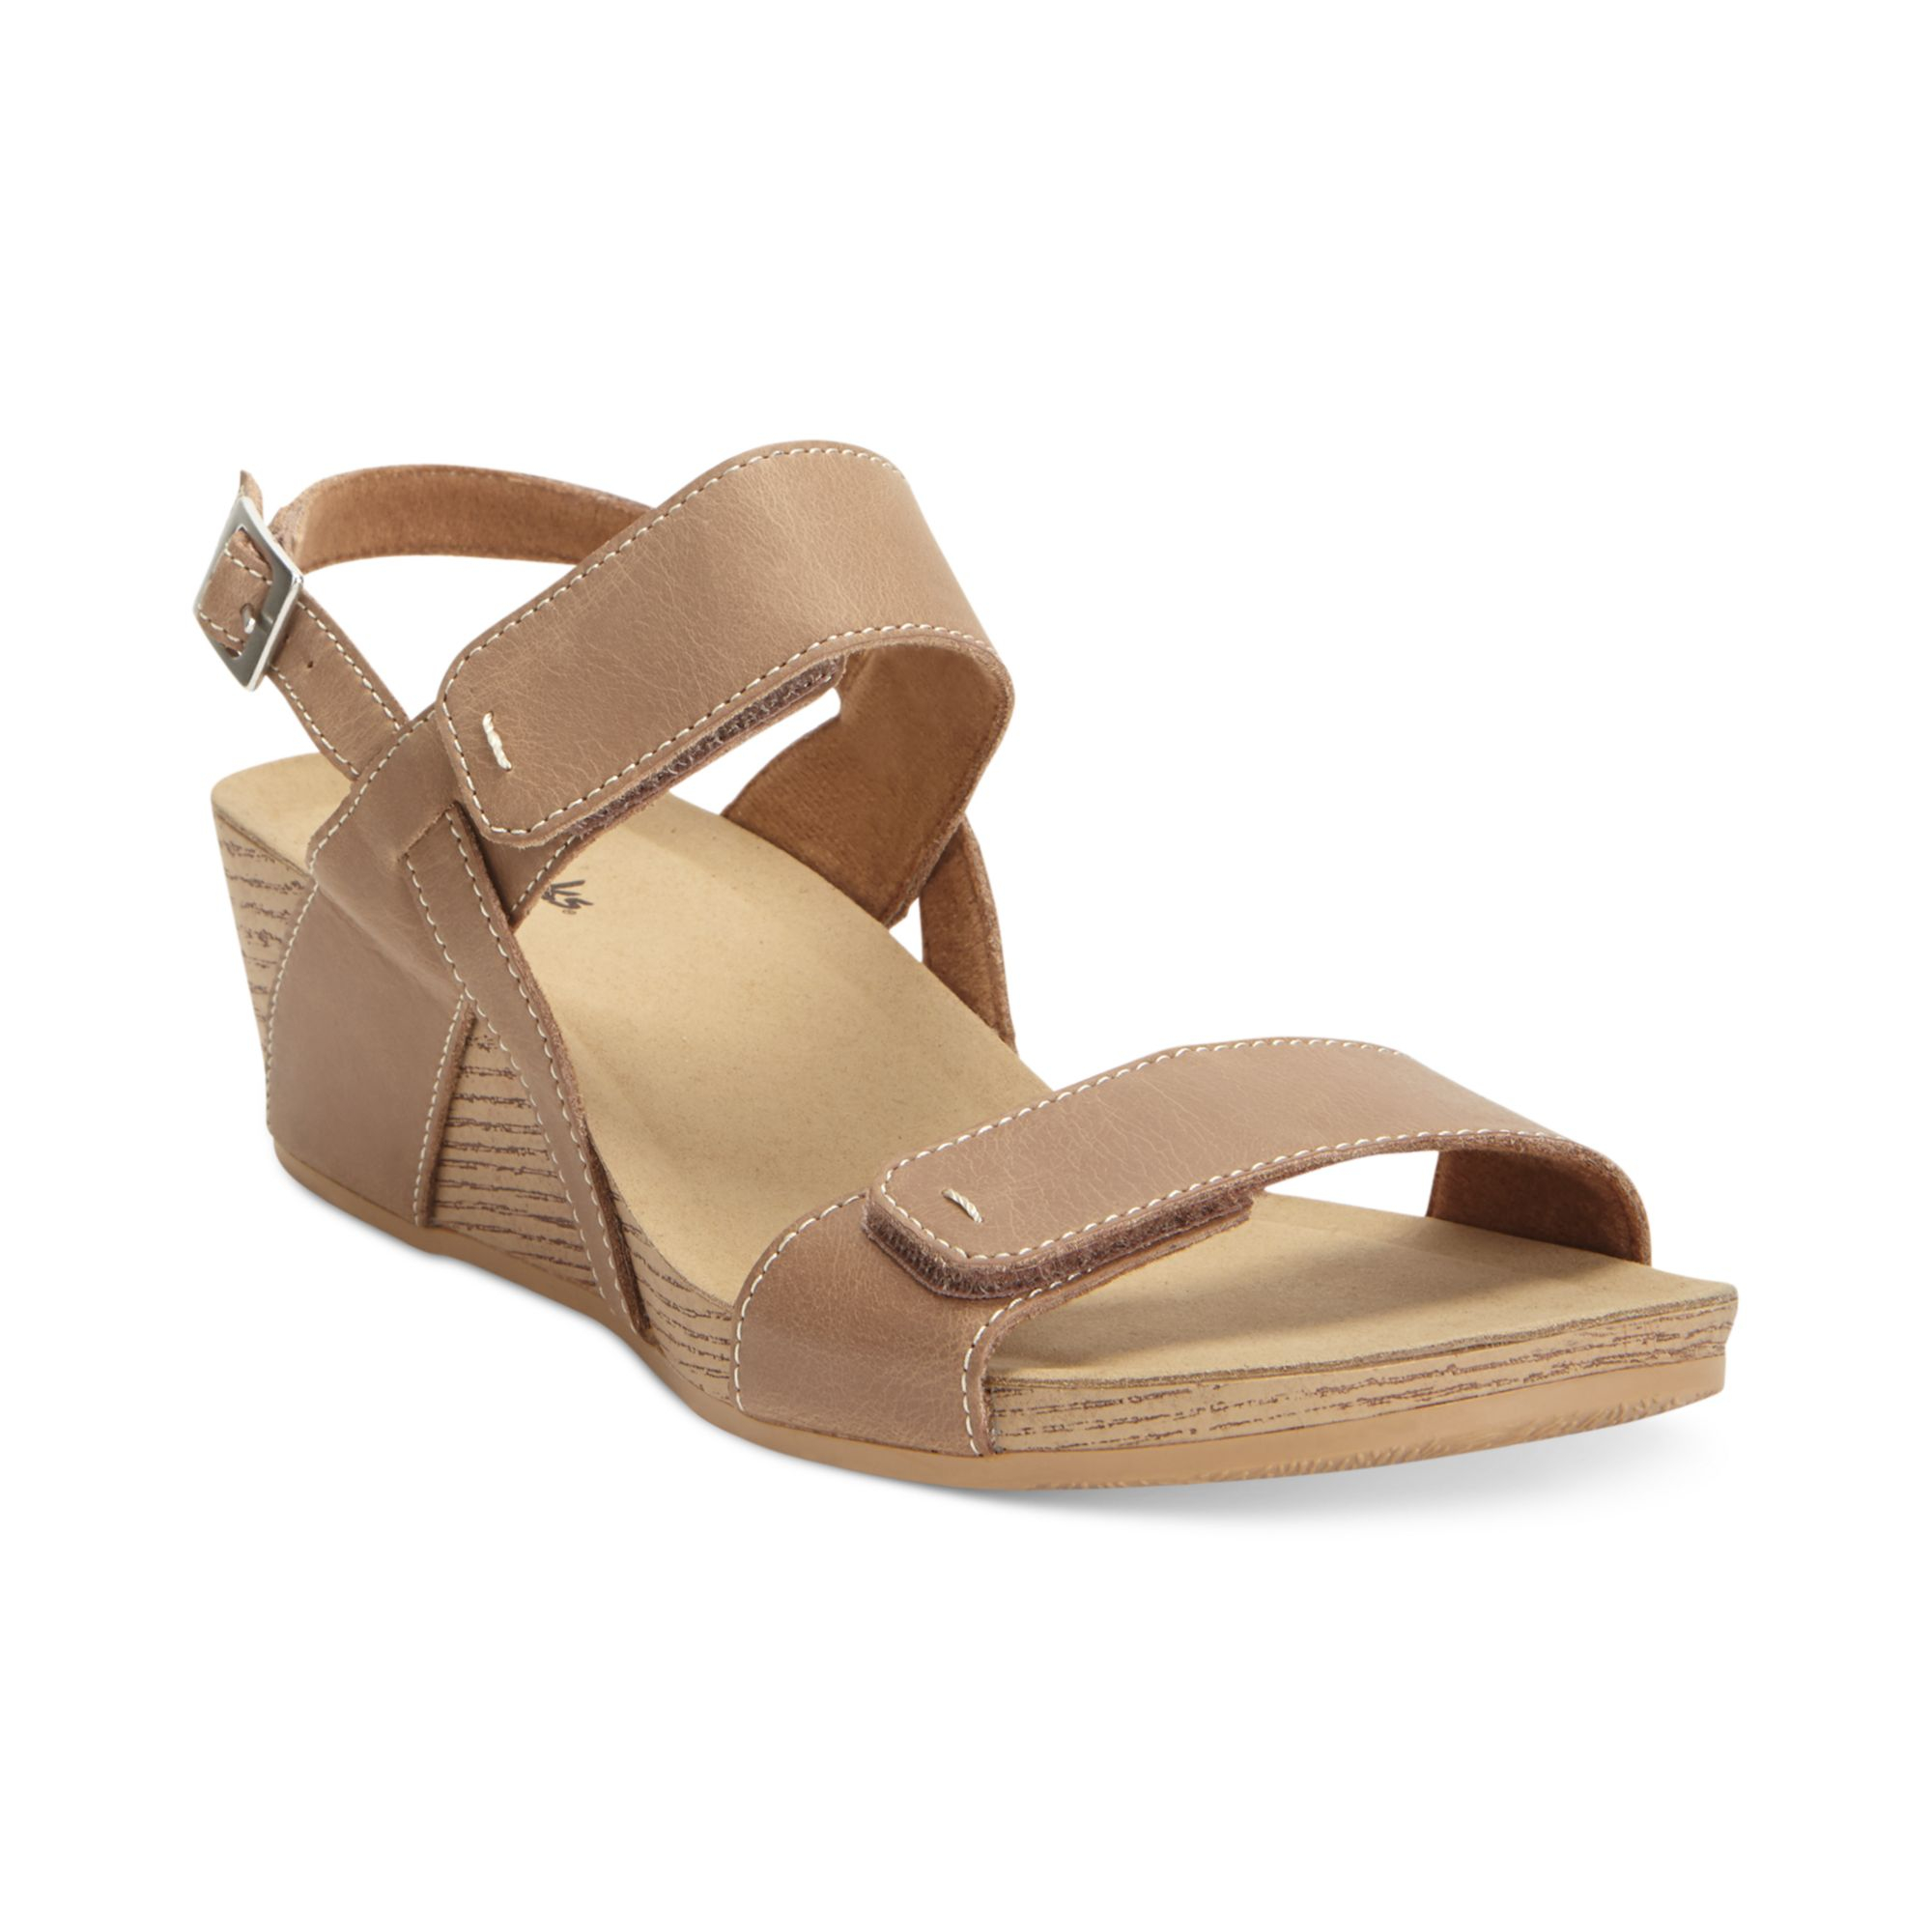 005c5228ee12 Lyst - Clarks Alto Disco Platform Wedge Sandals in Natural